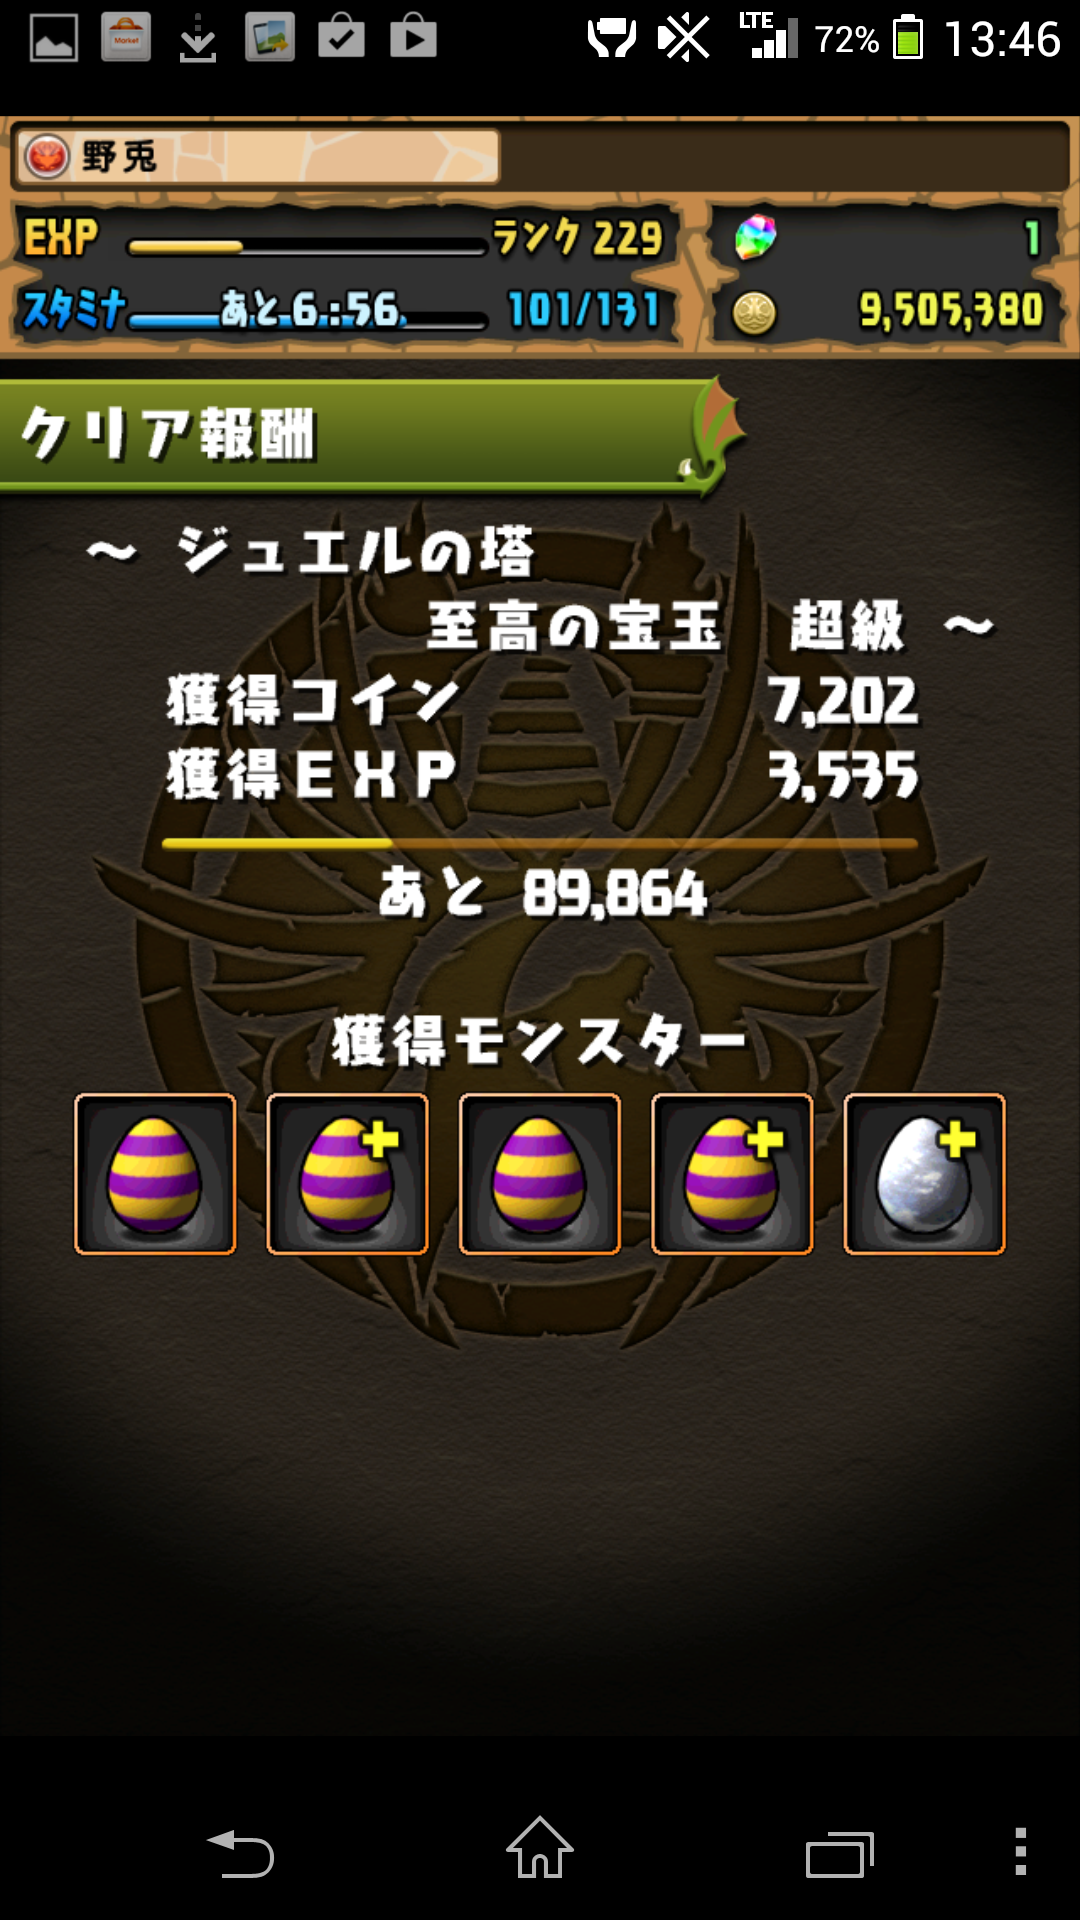 Screenshot_2014-04-19-13-46-02.png